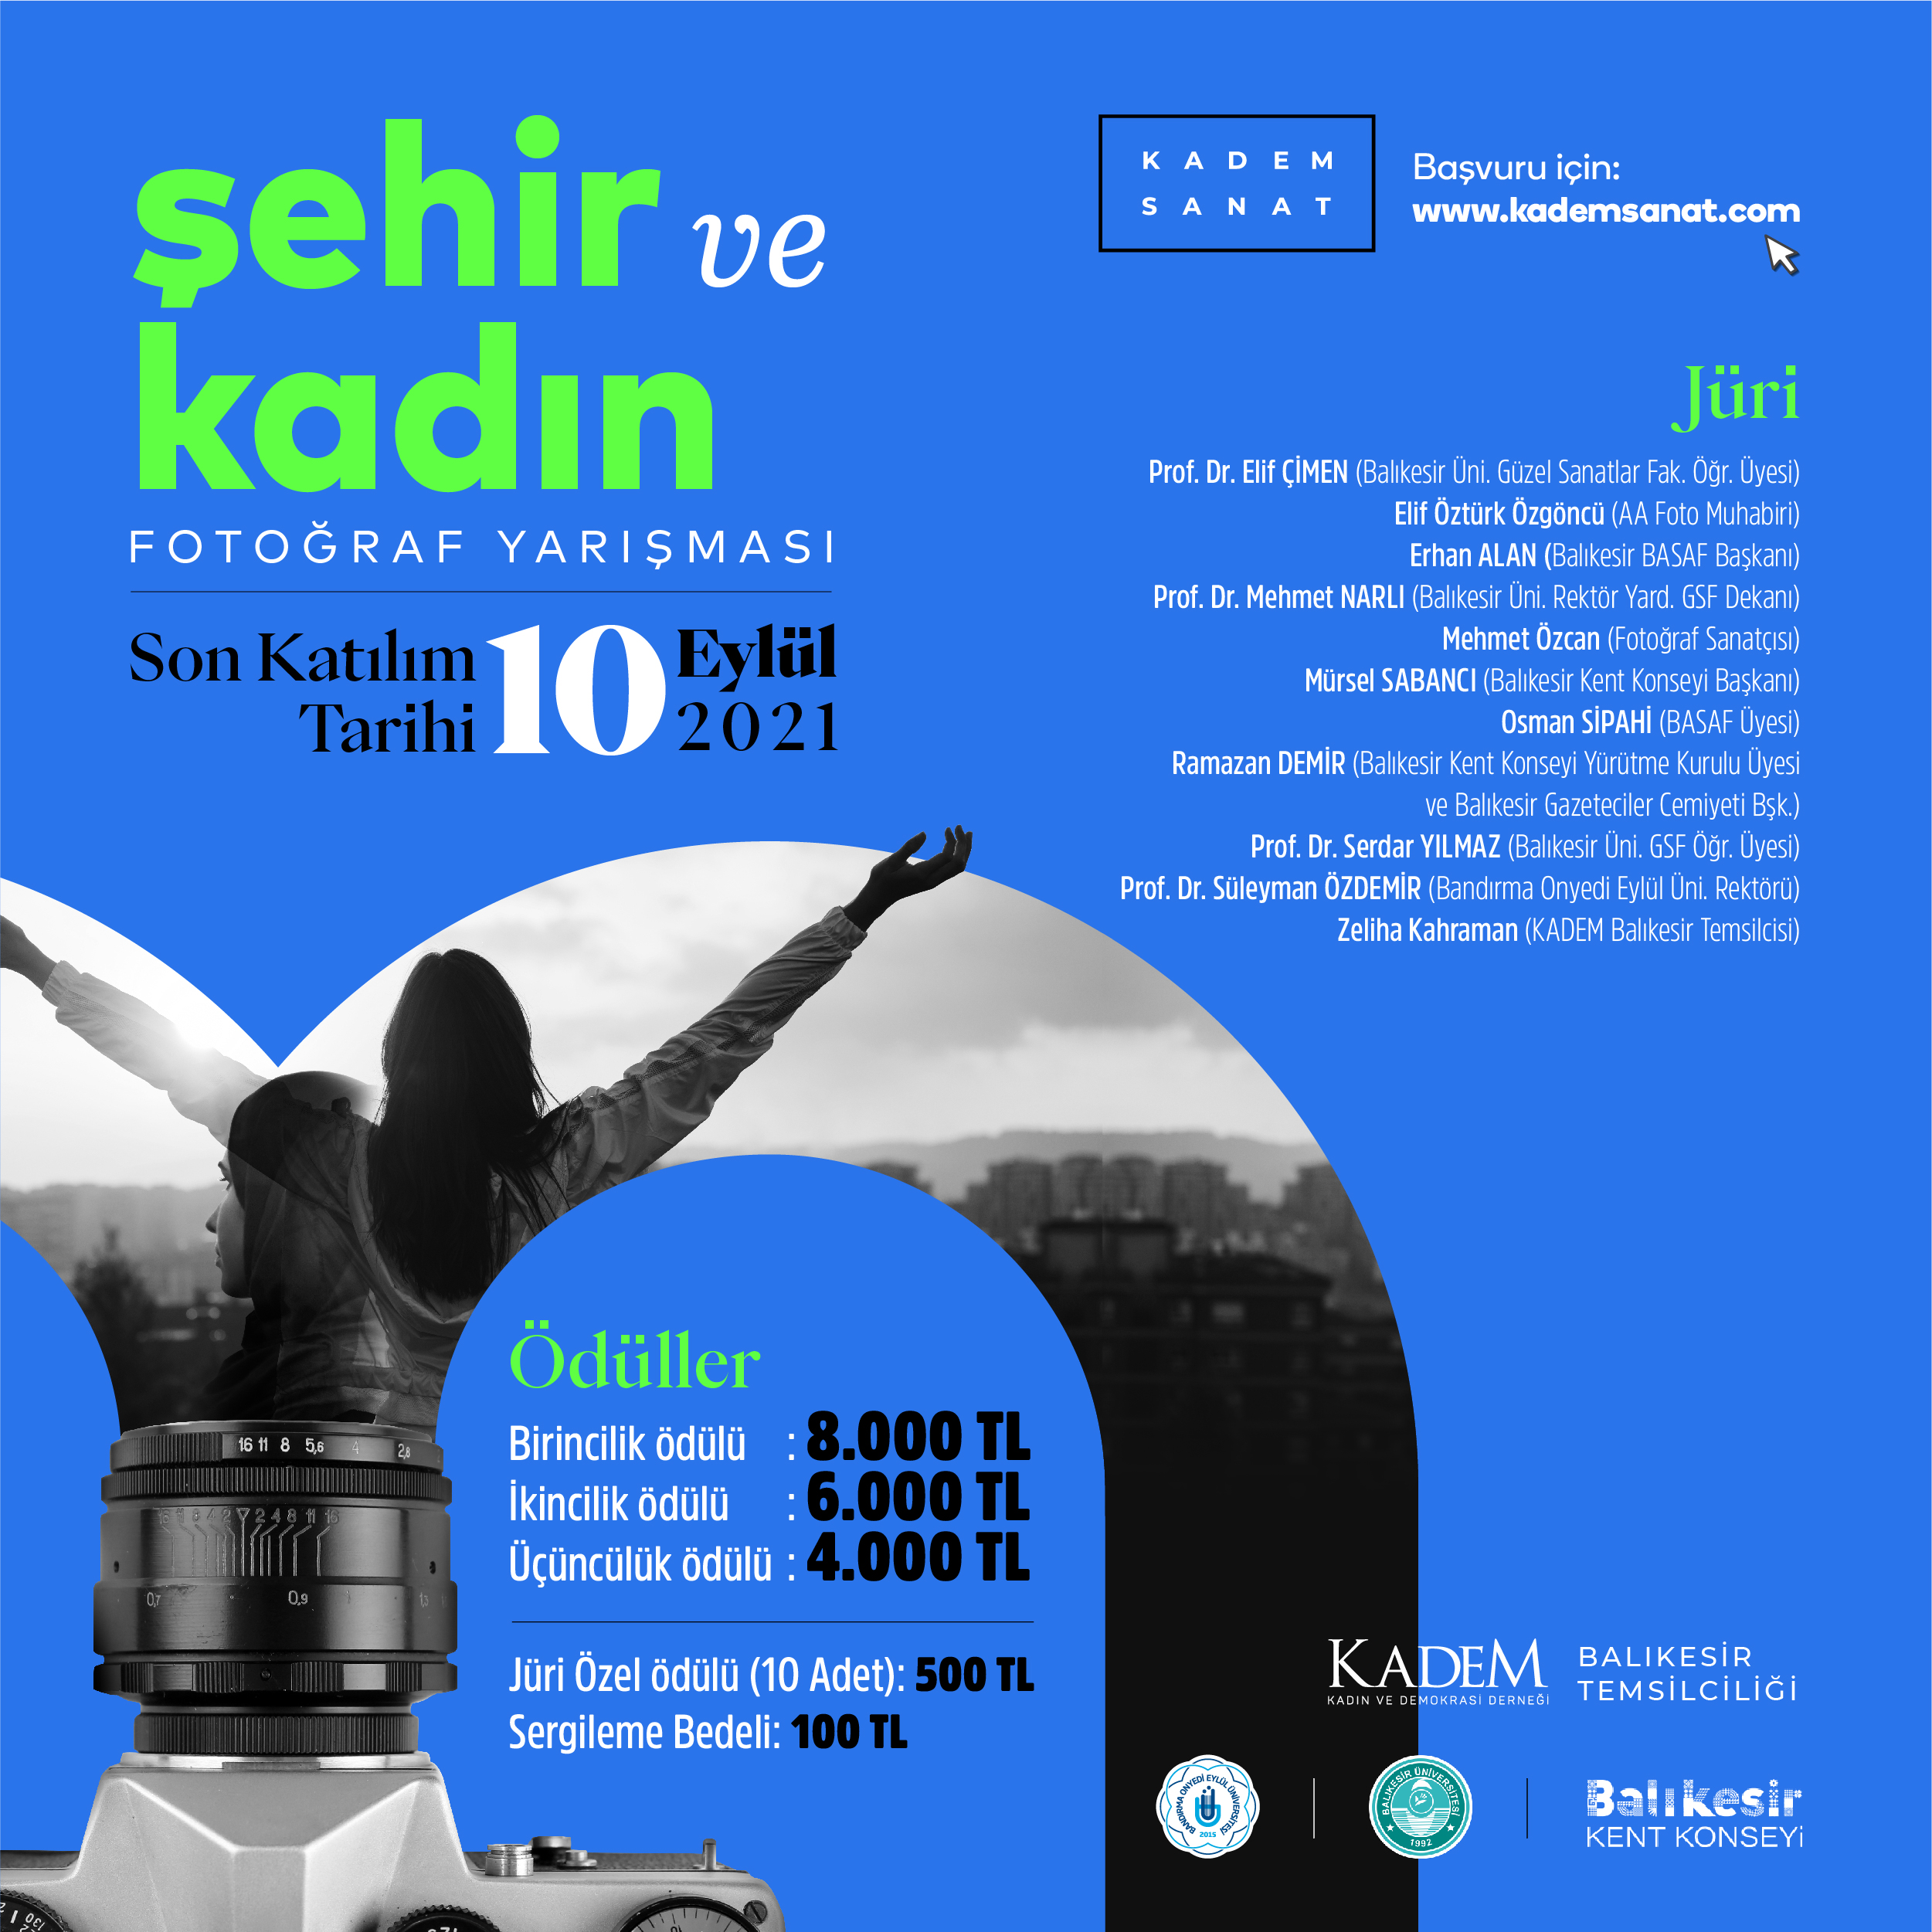 kadem-sanat-balikesir-fotograf-sm-facebook-1.jpg